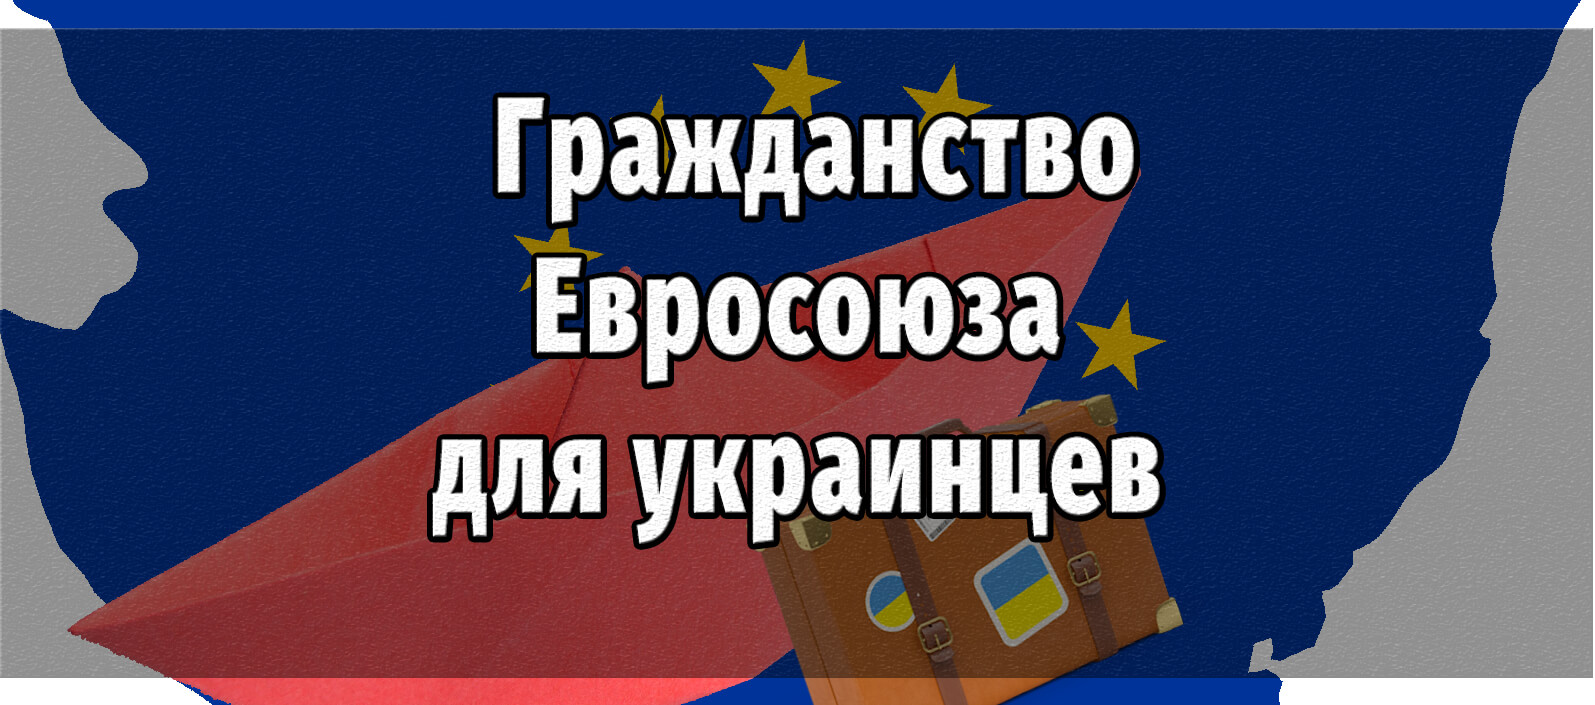 гражданство ес для украинцев